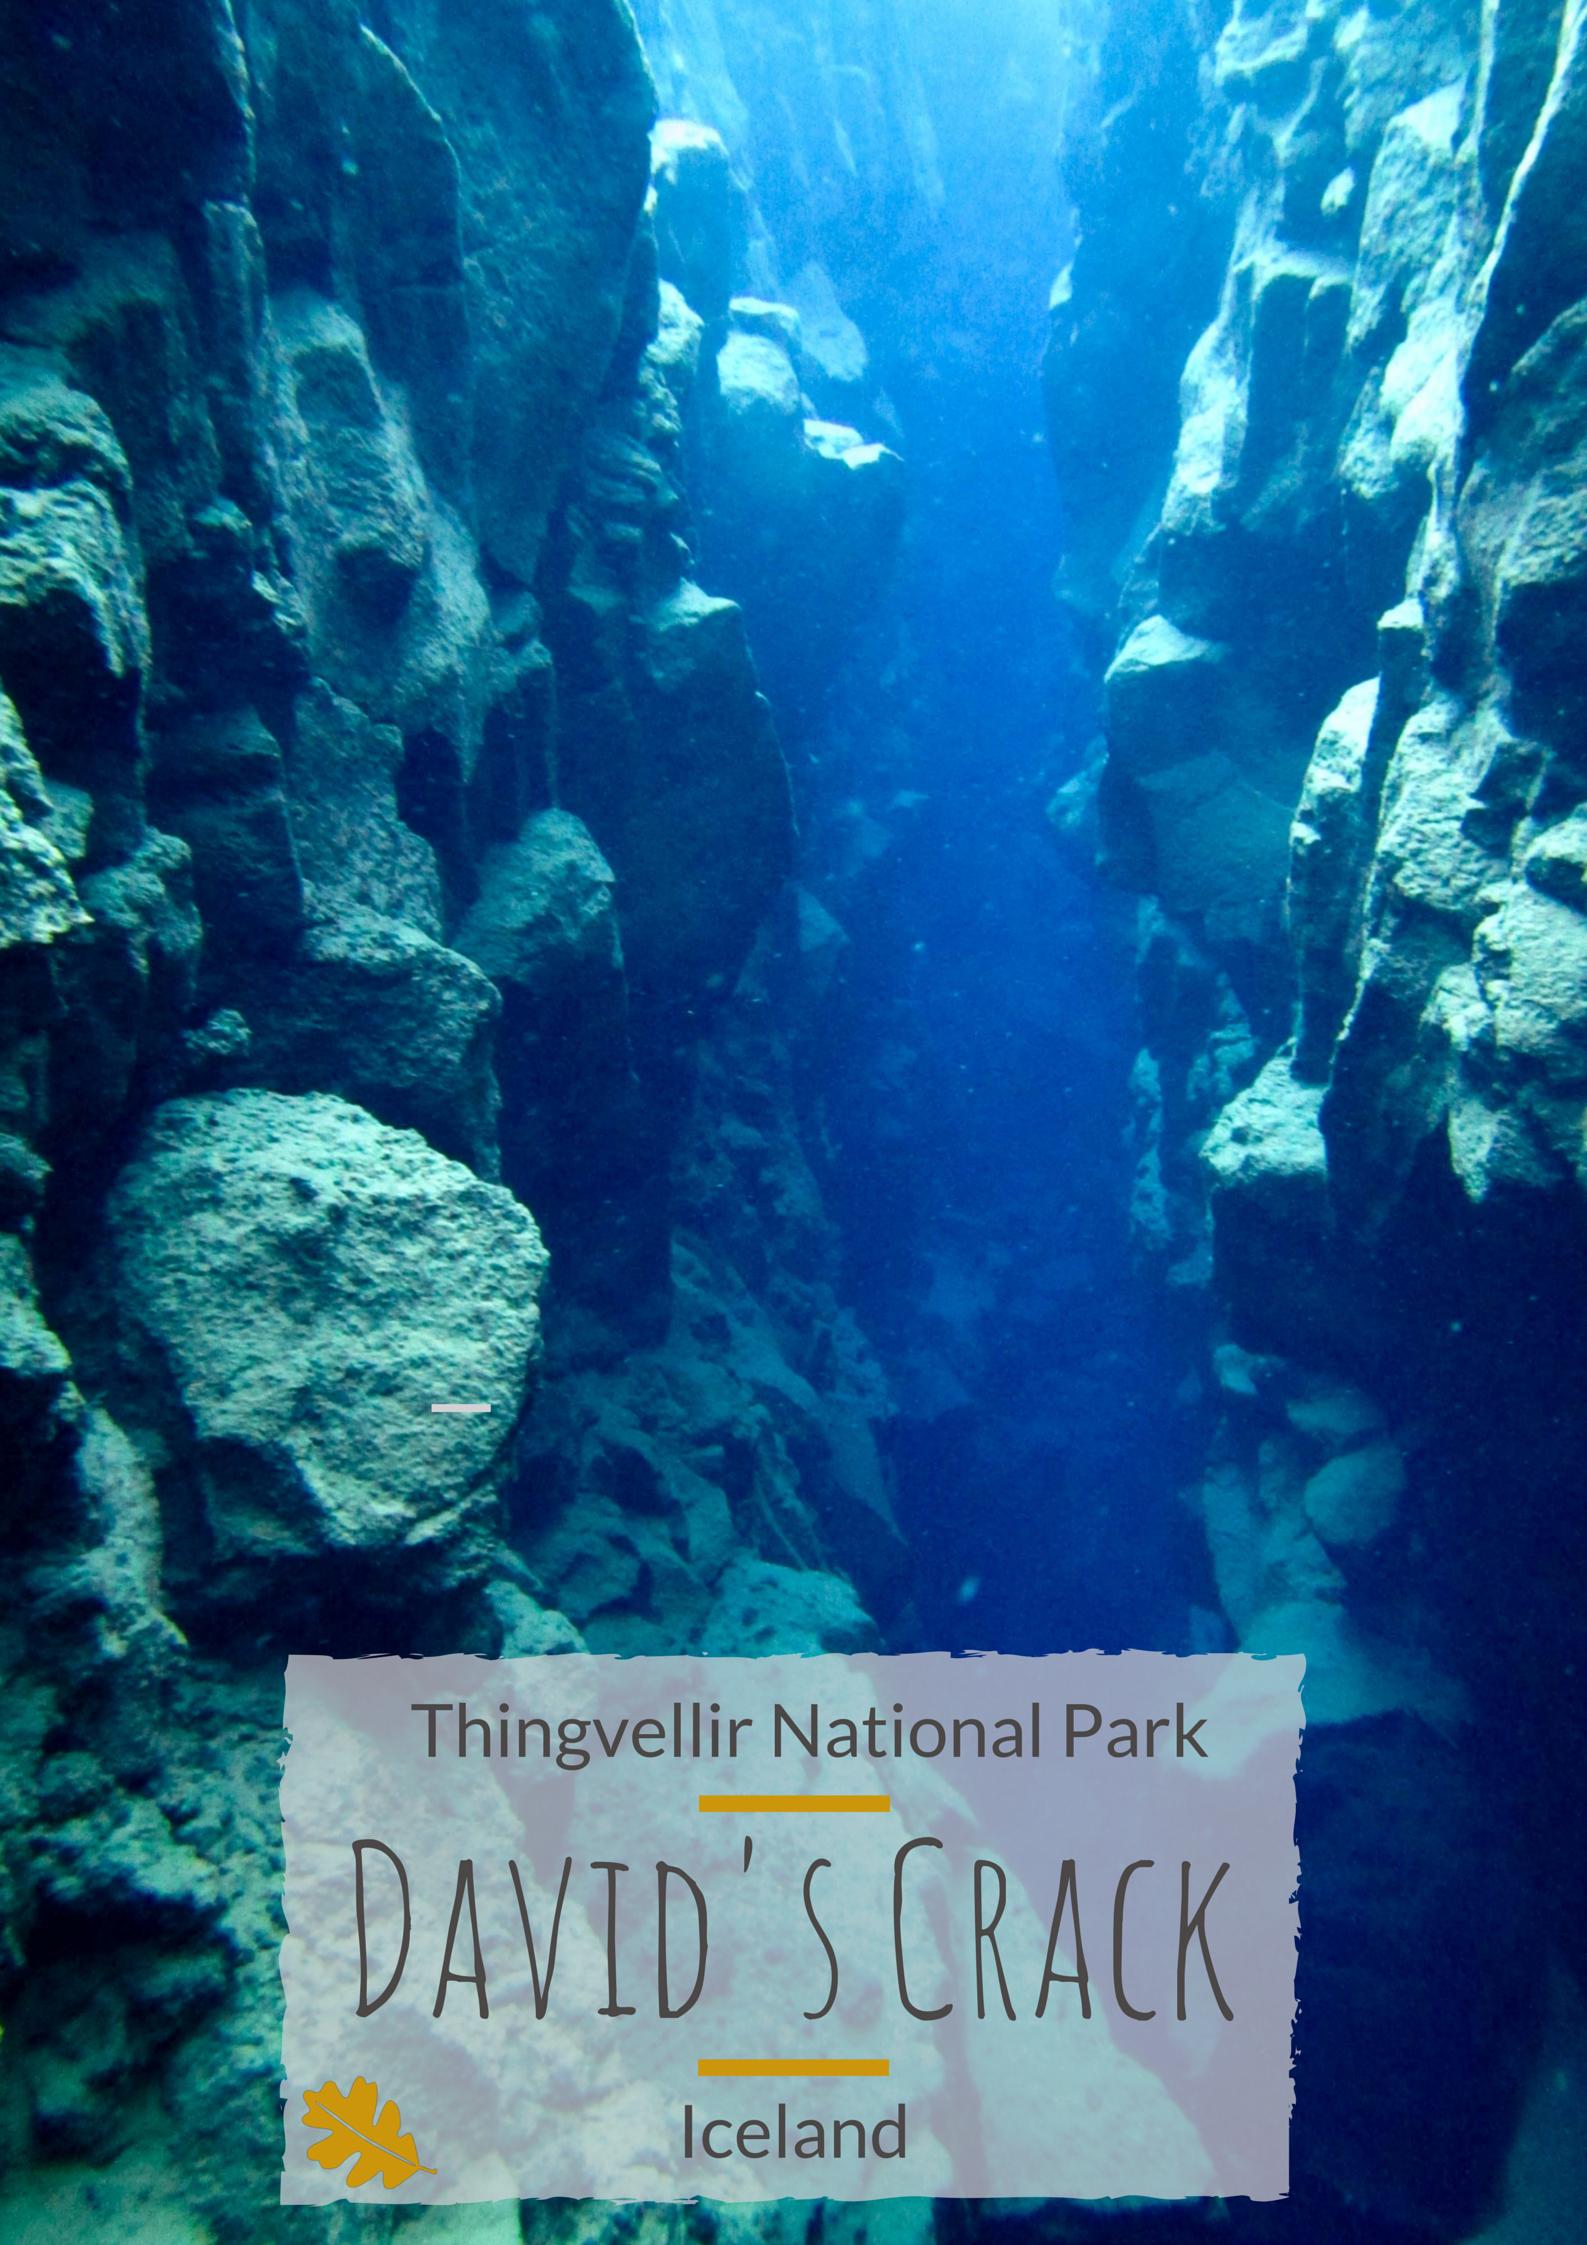 Thingvellir National Park Diving